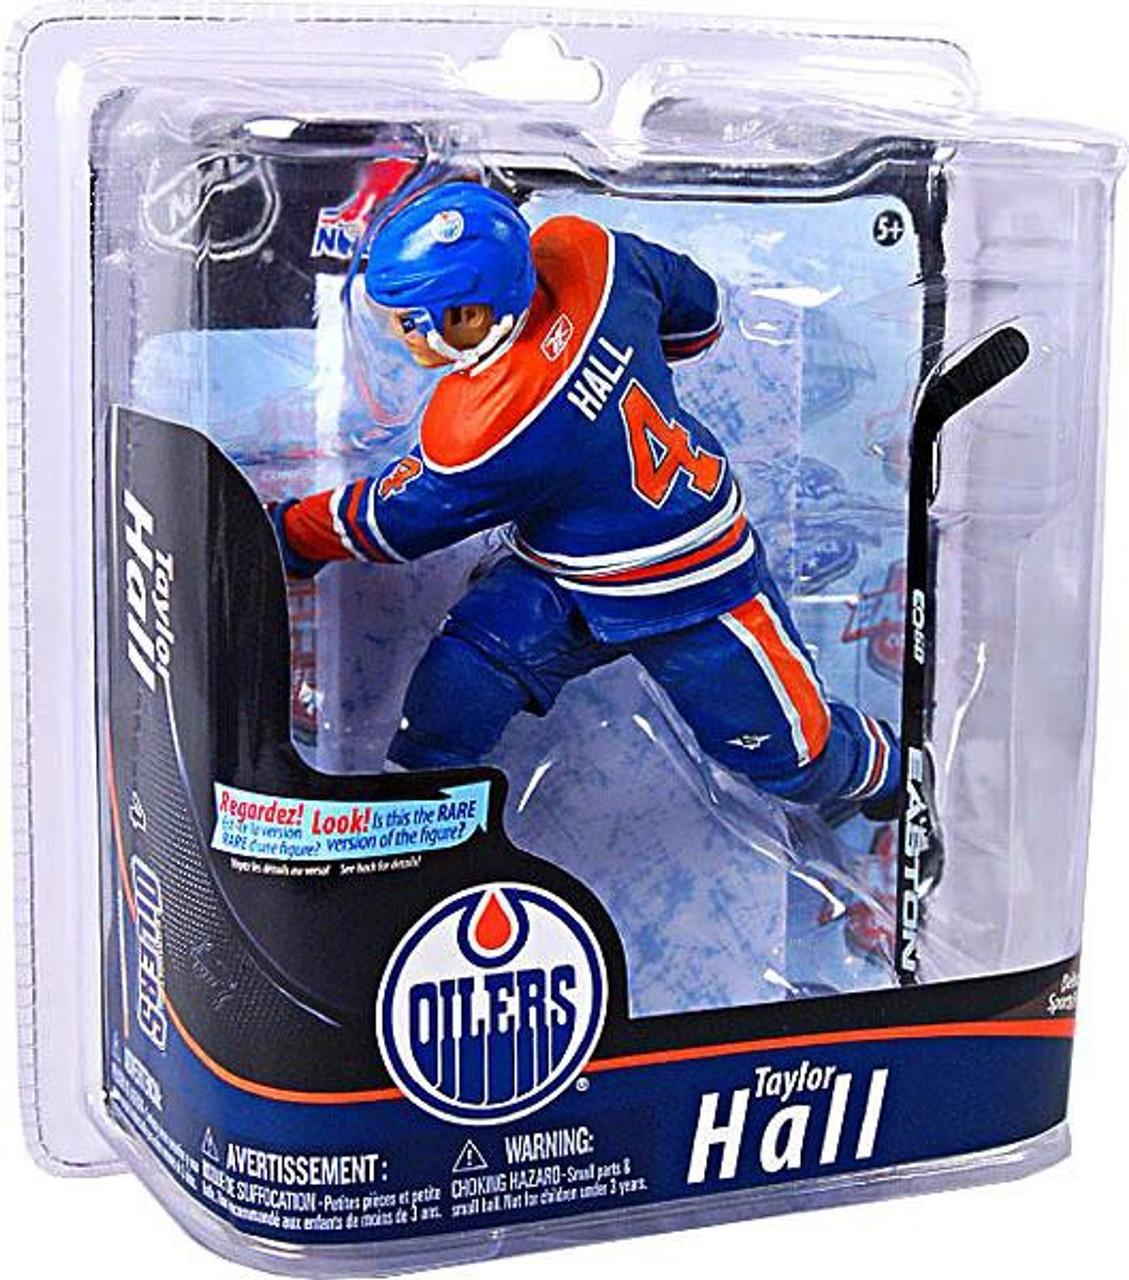 McFarlane Toys NHL Edmonton Oilers Sports Picks Series 28 Taylor Hall Action Figure [Blue & Orange Jersey]